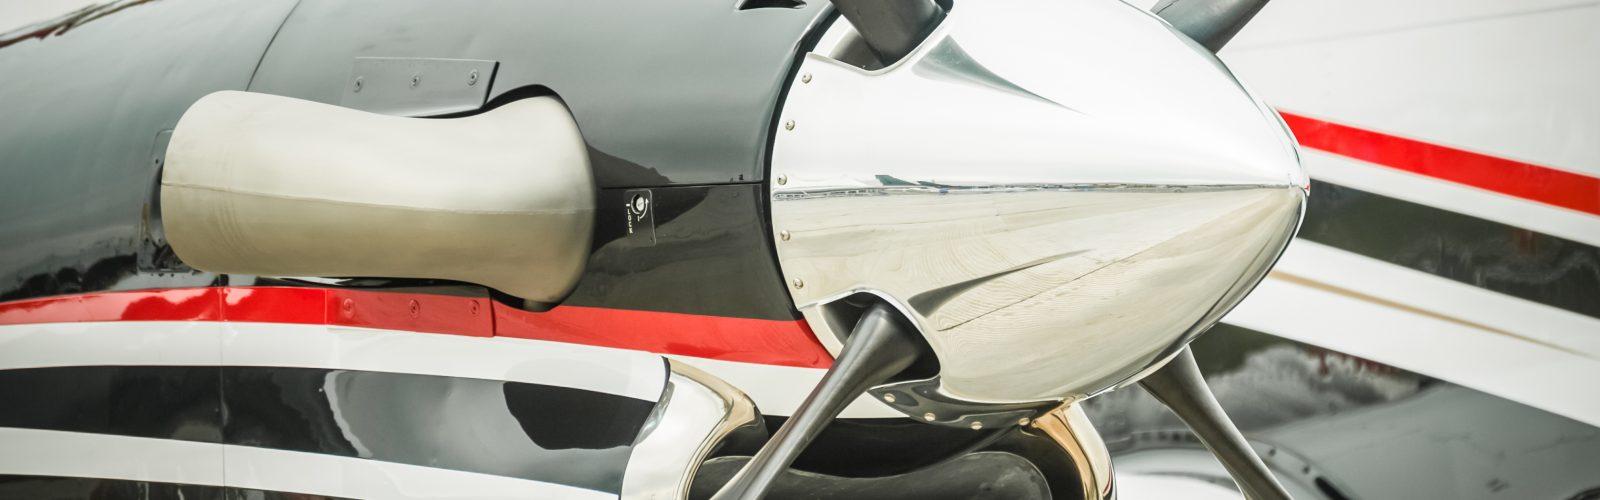 Aircraft Capability